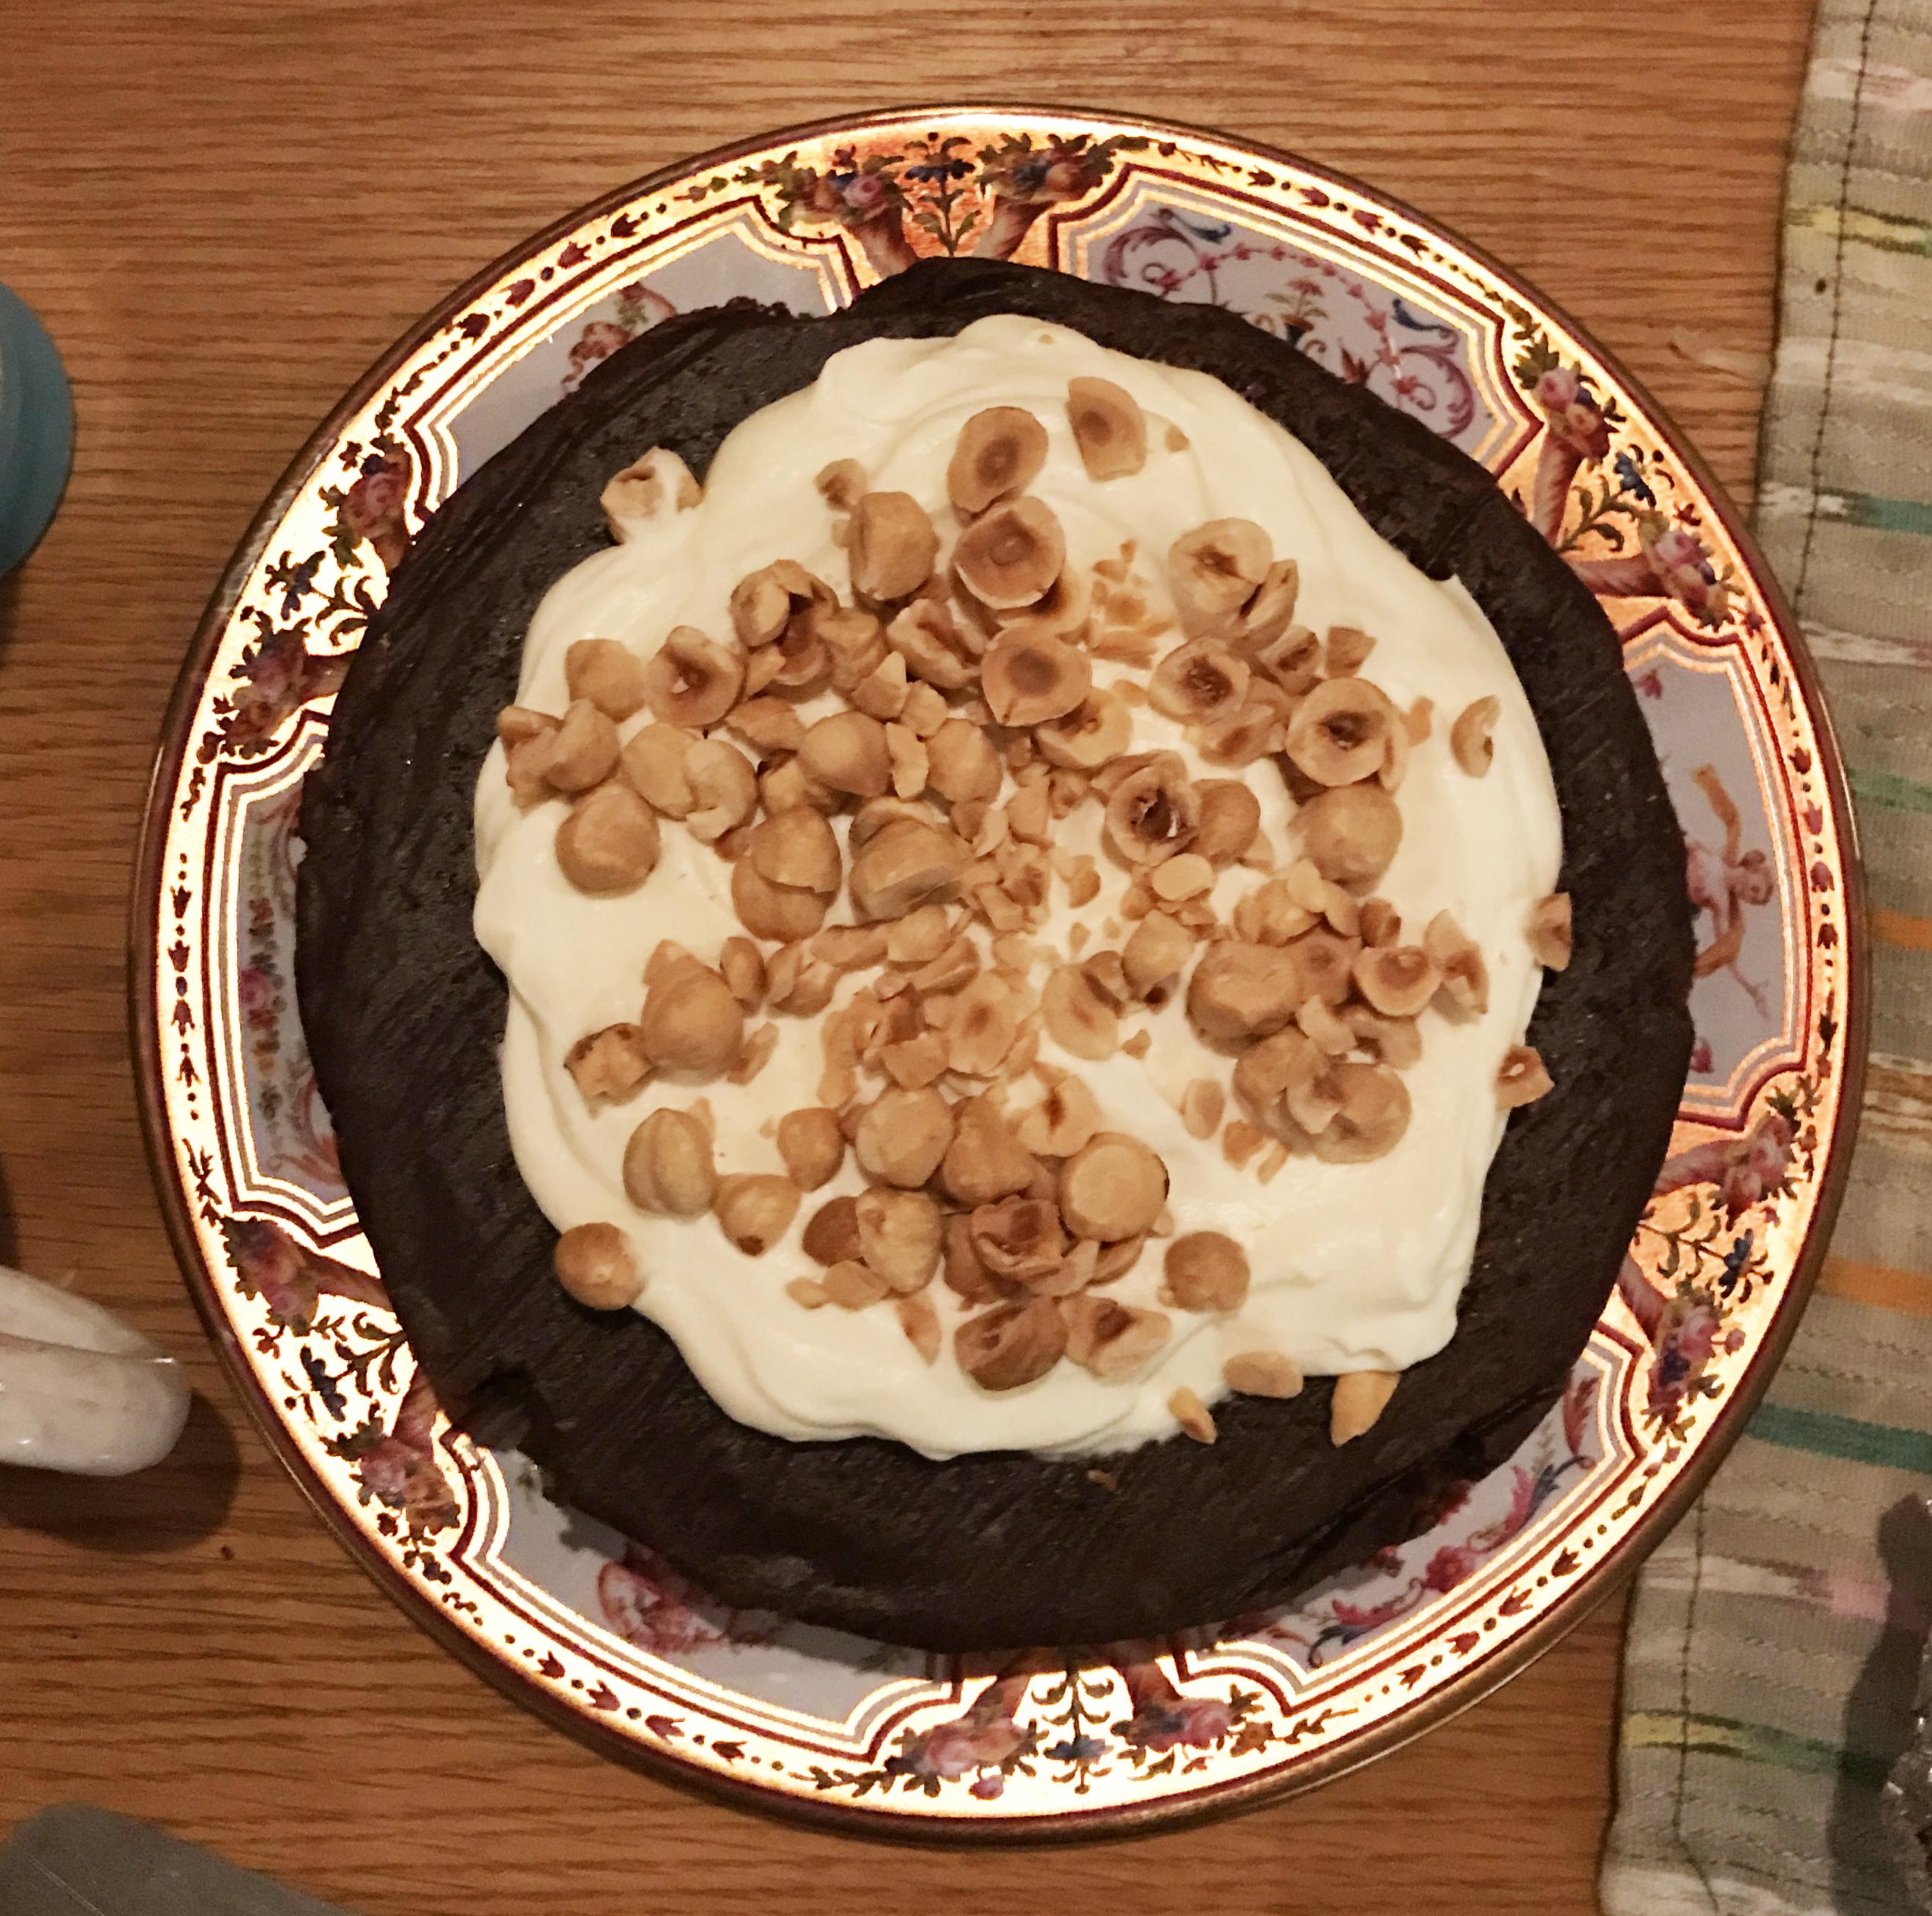 Flourless Chocolate Cake For Sale